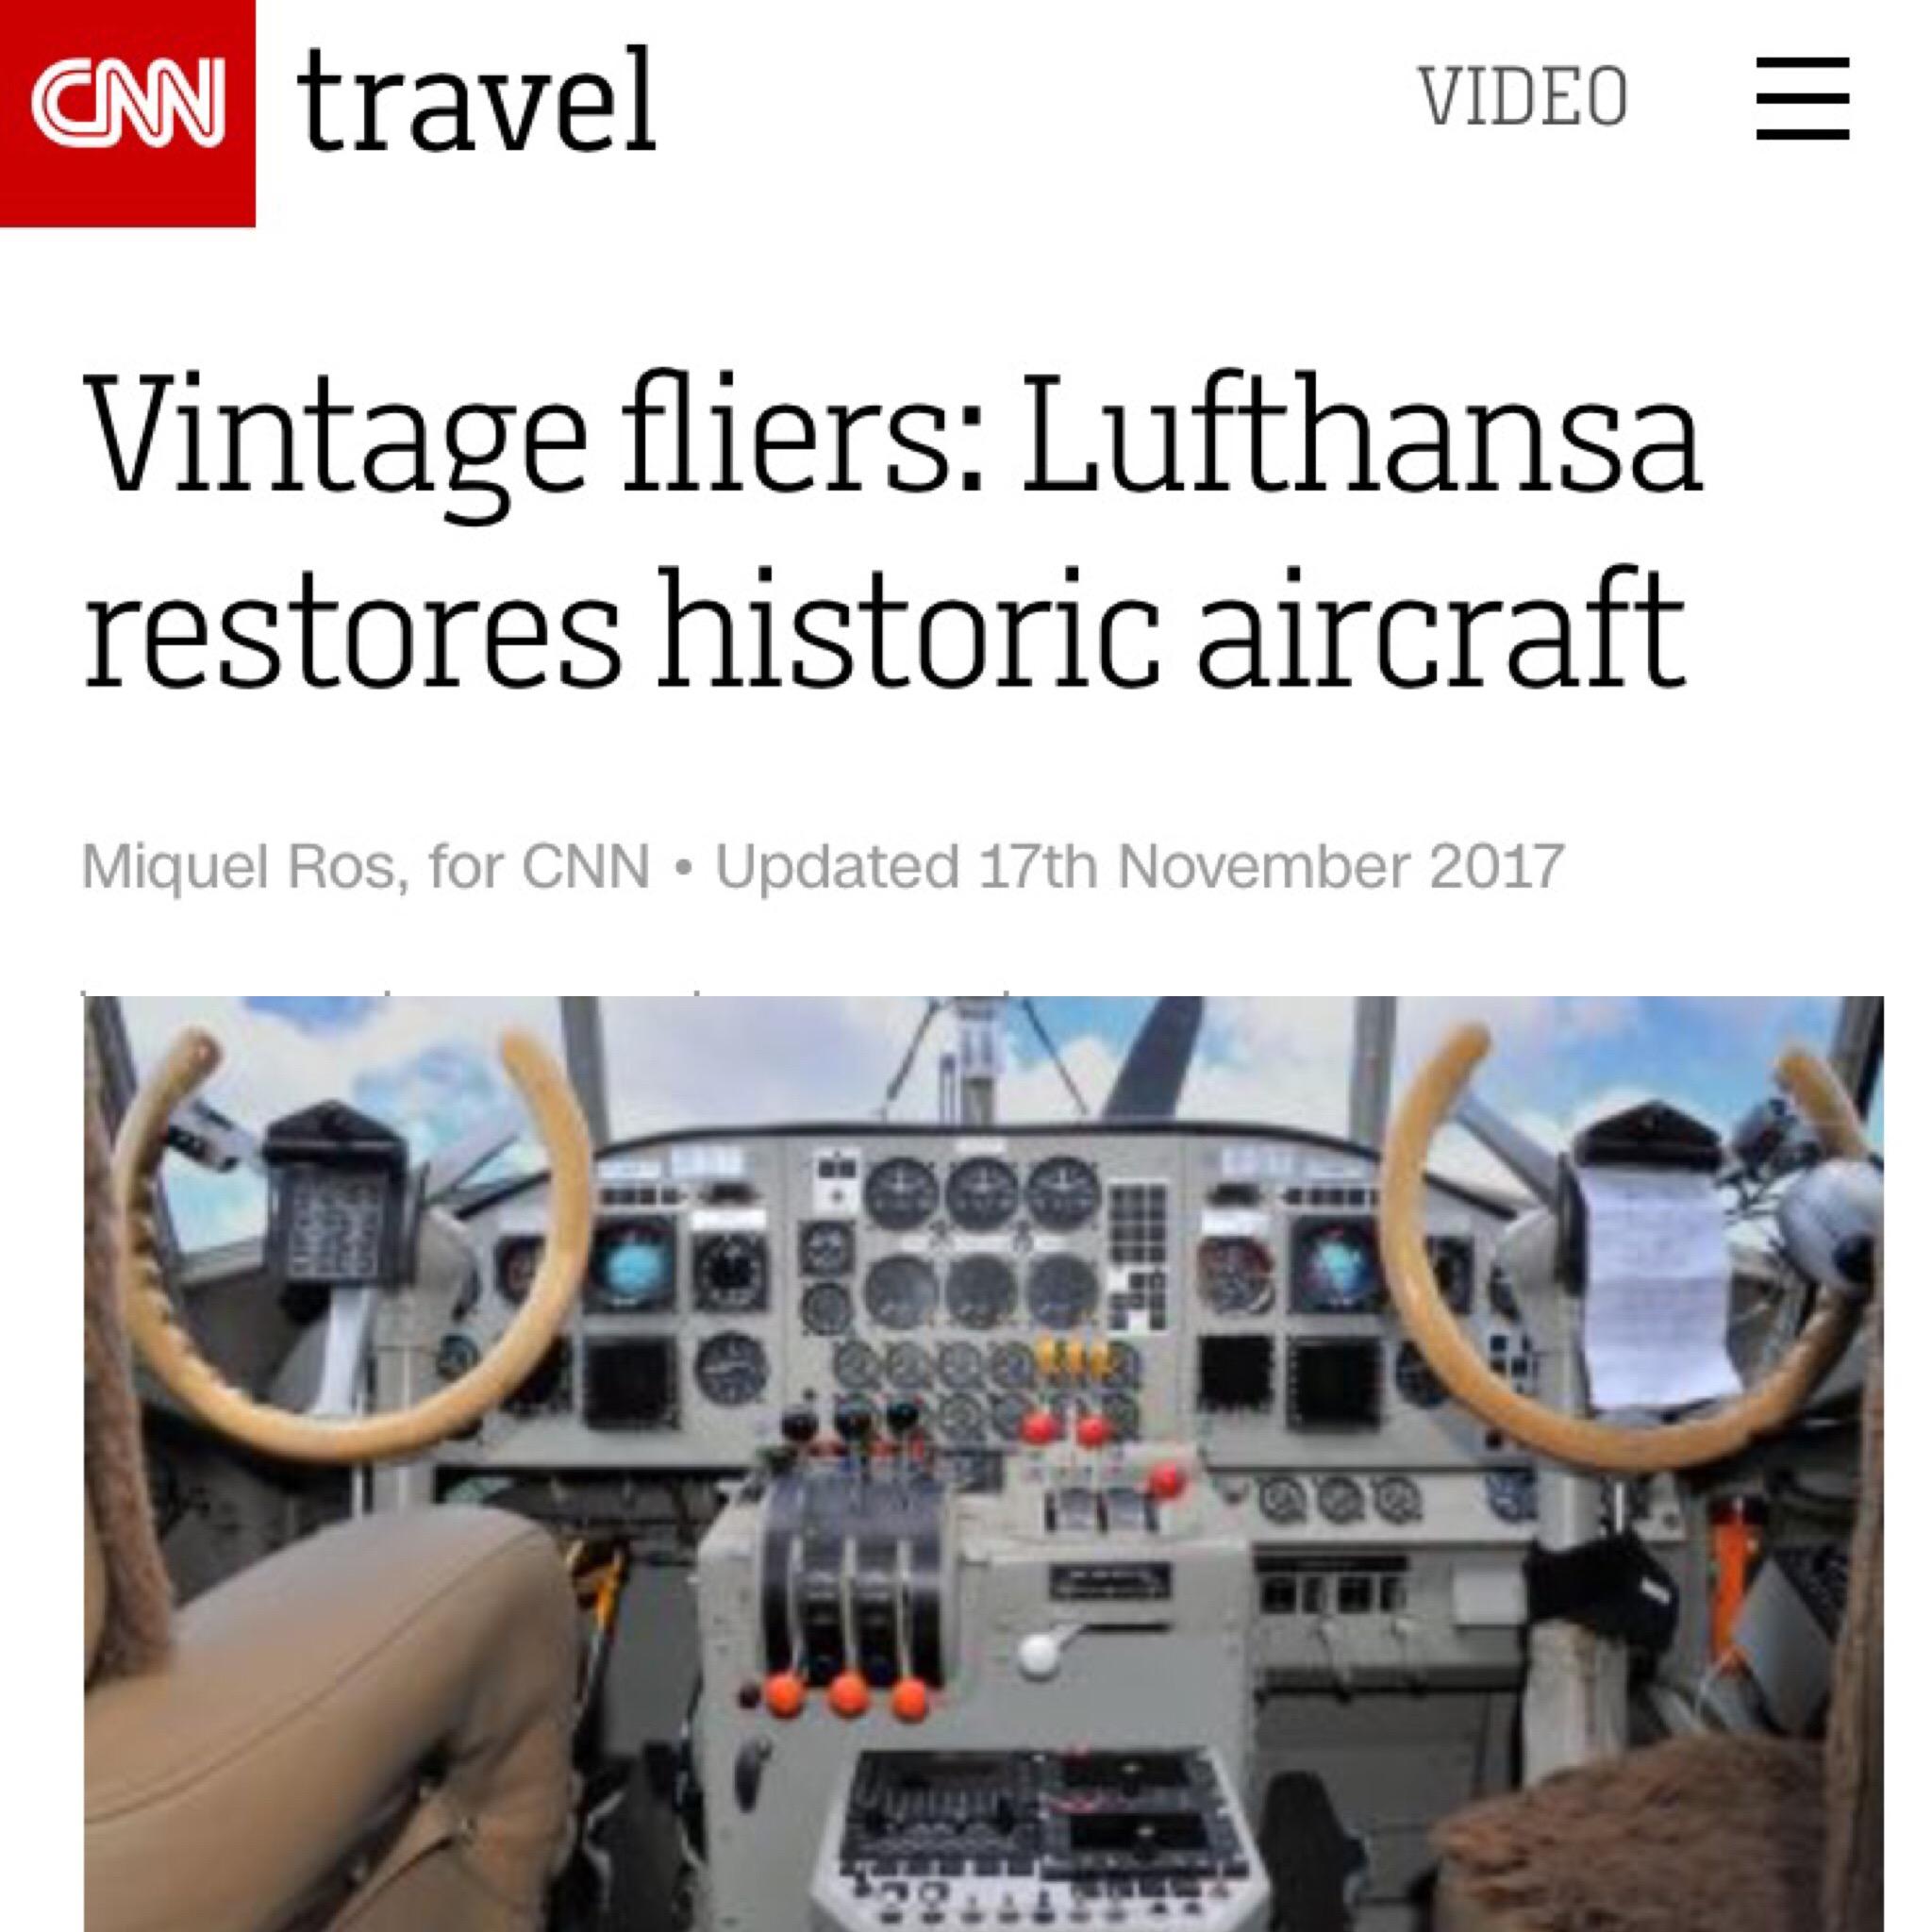 Lufthansa historical aircraft.JPG